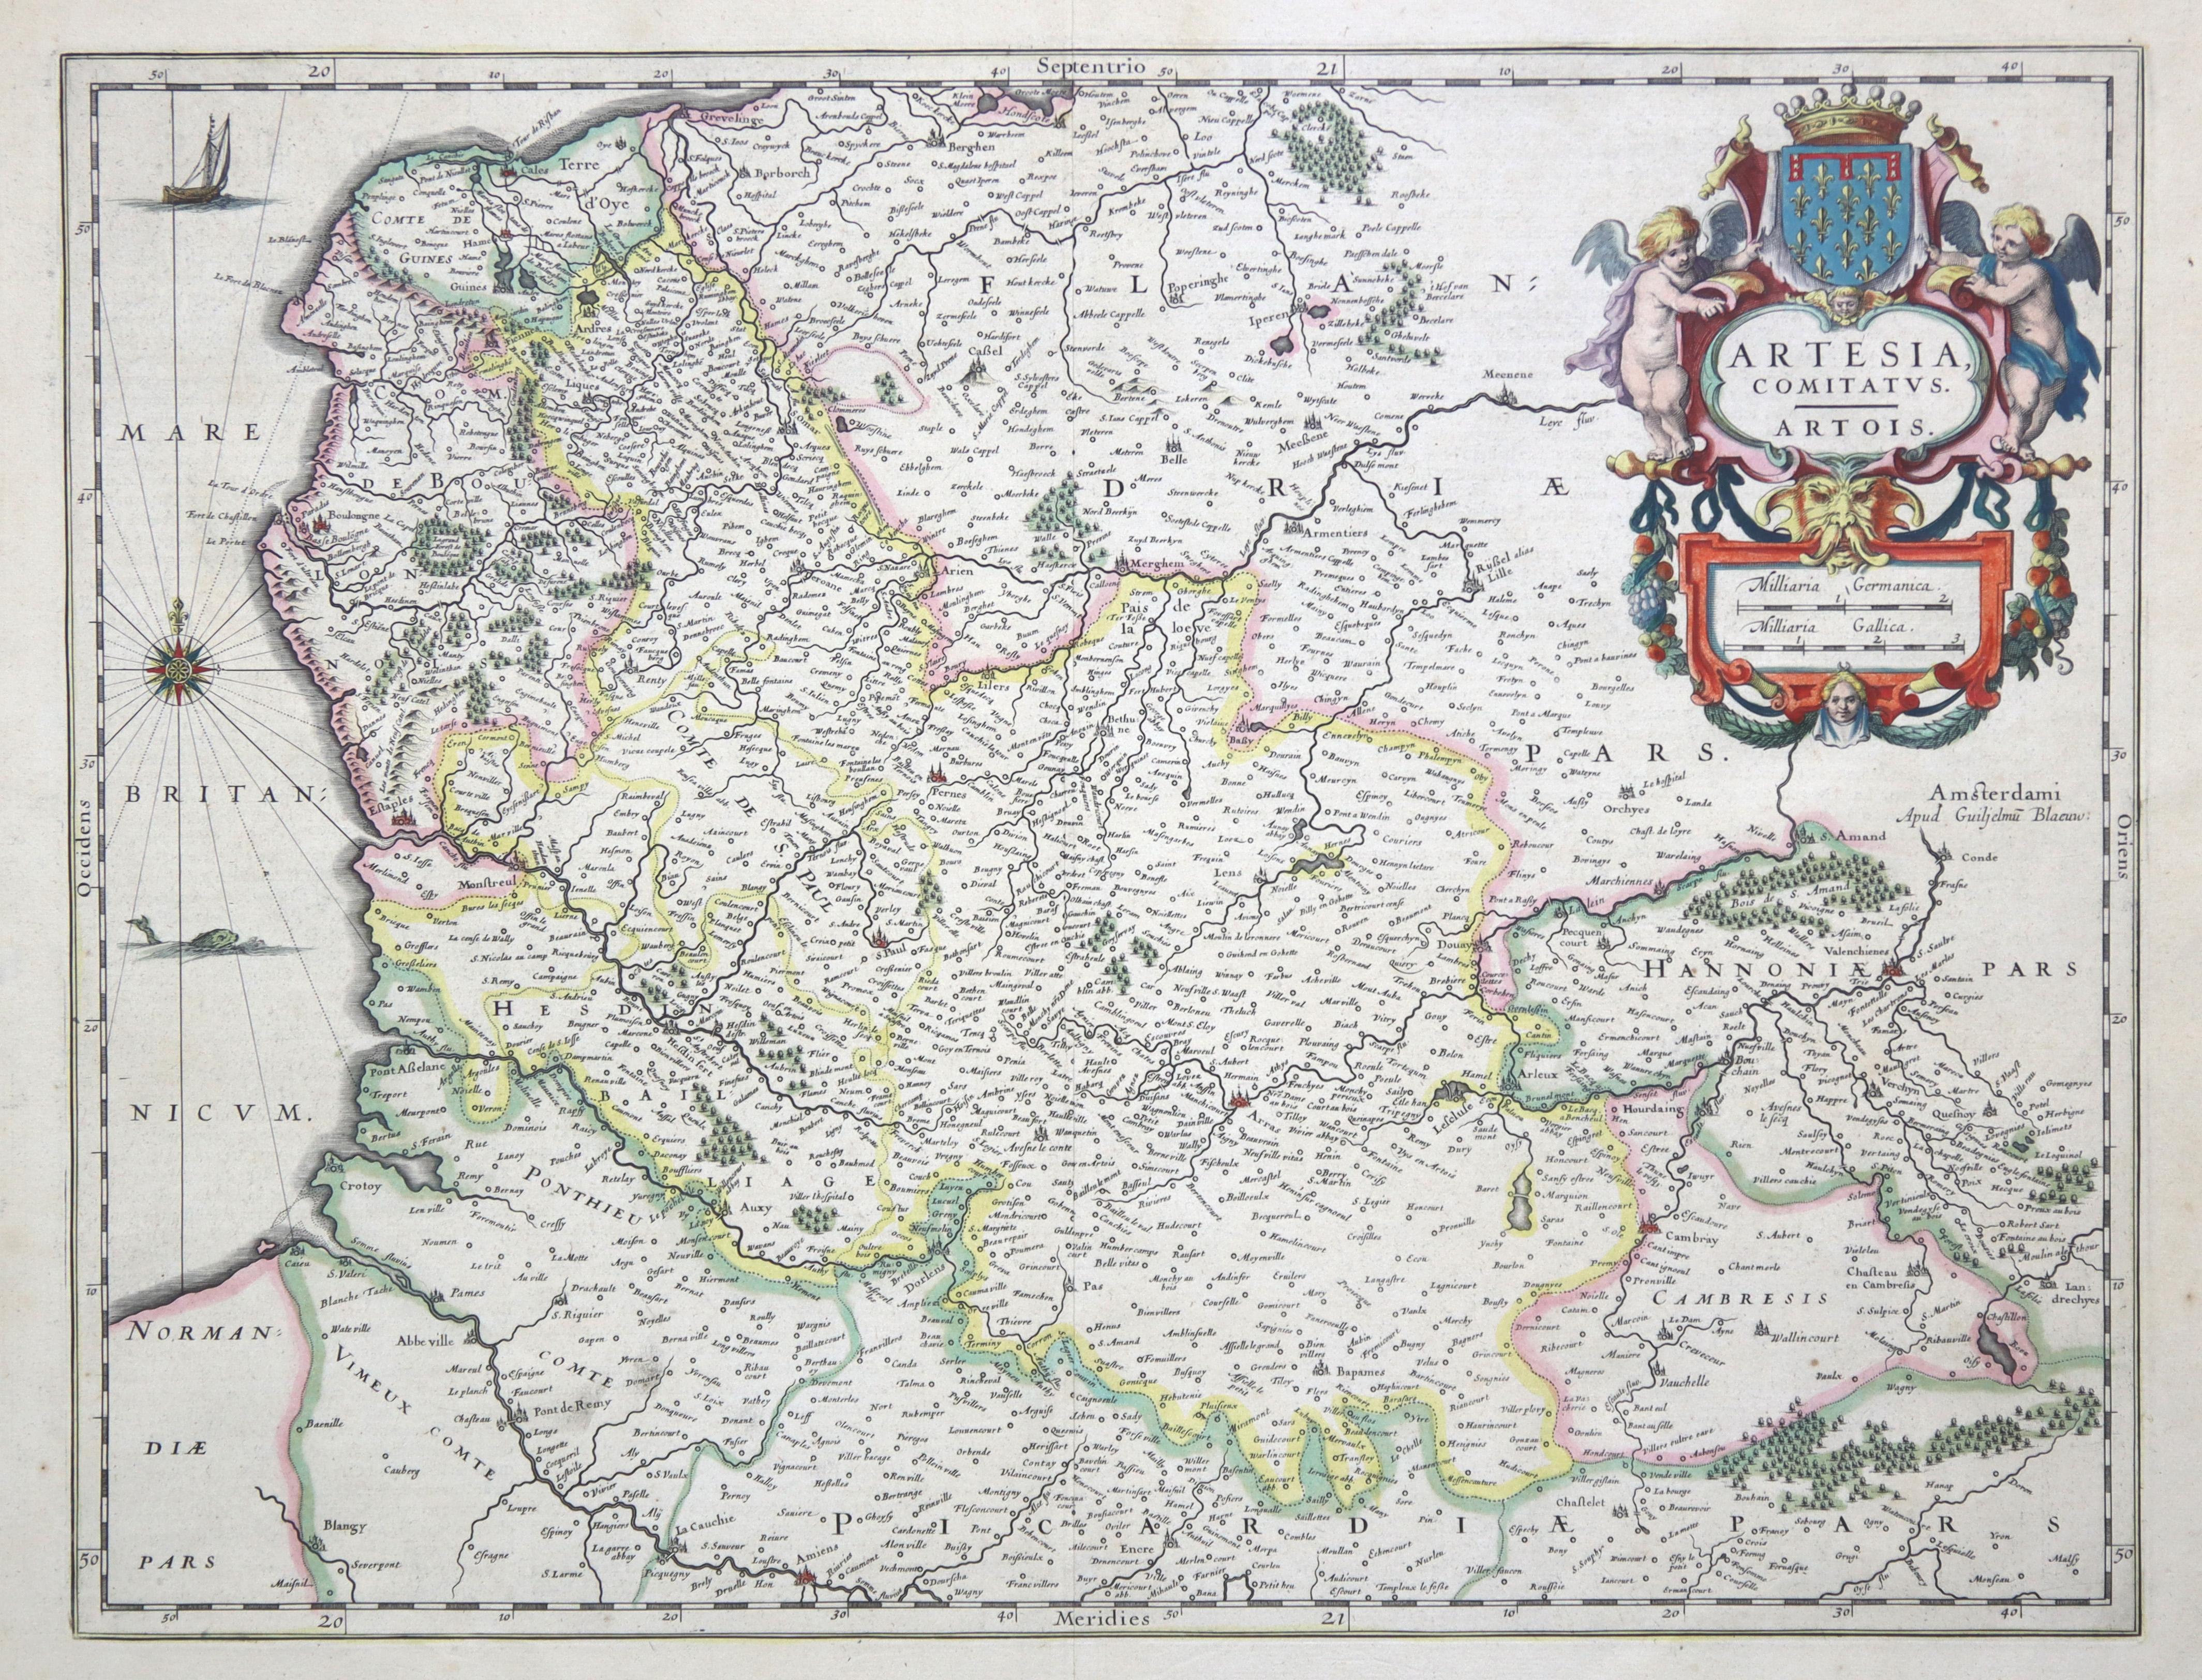 "Kst.- Karte, b. Guil. Blaeu, ""Artesia Comitatvs.: Artois:"